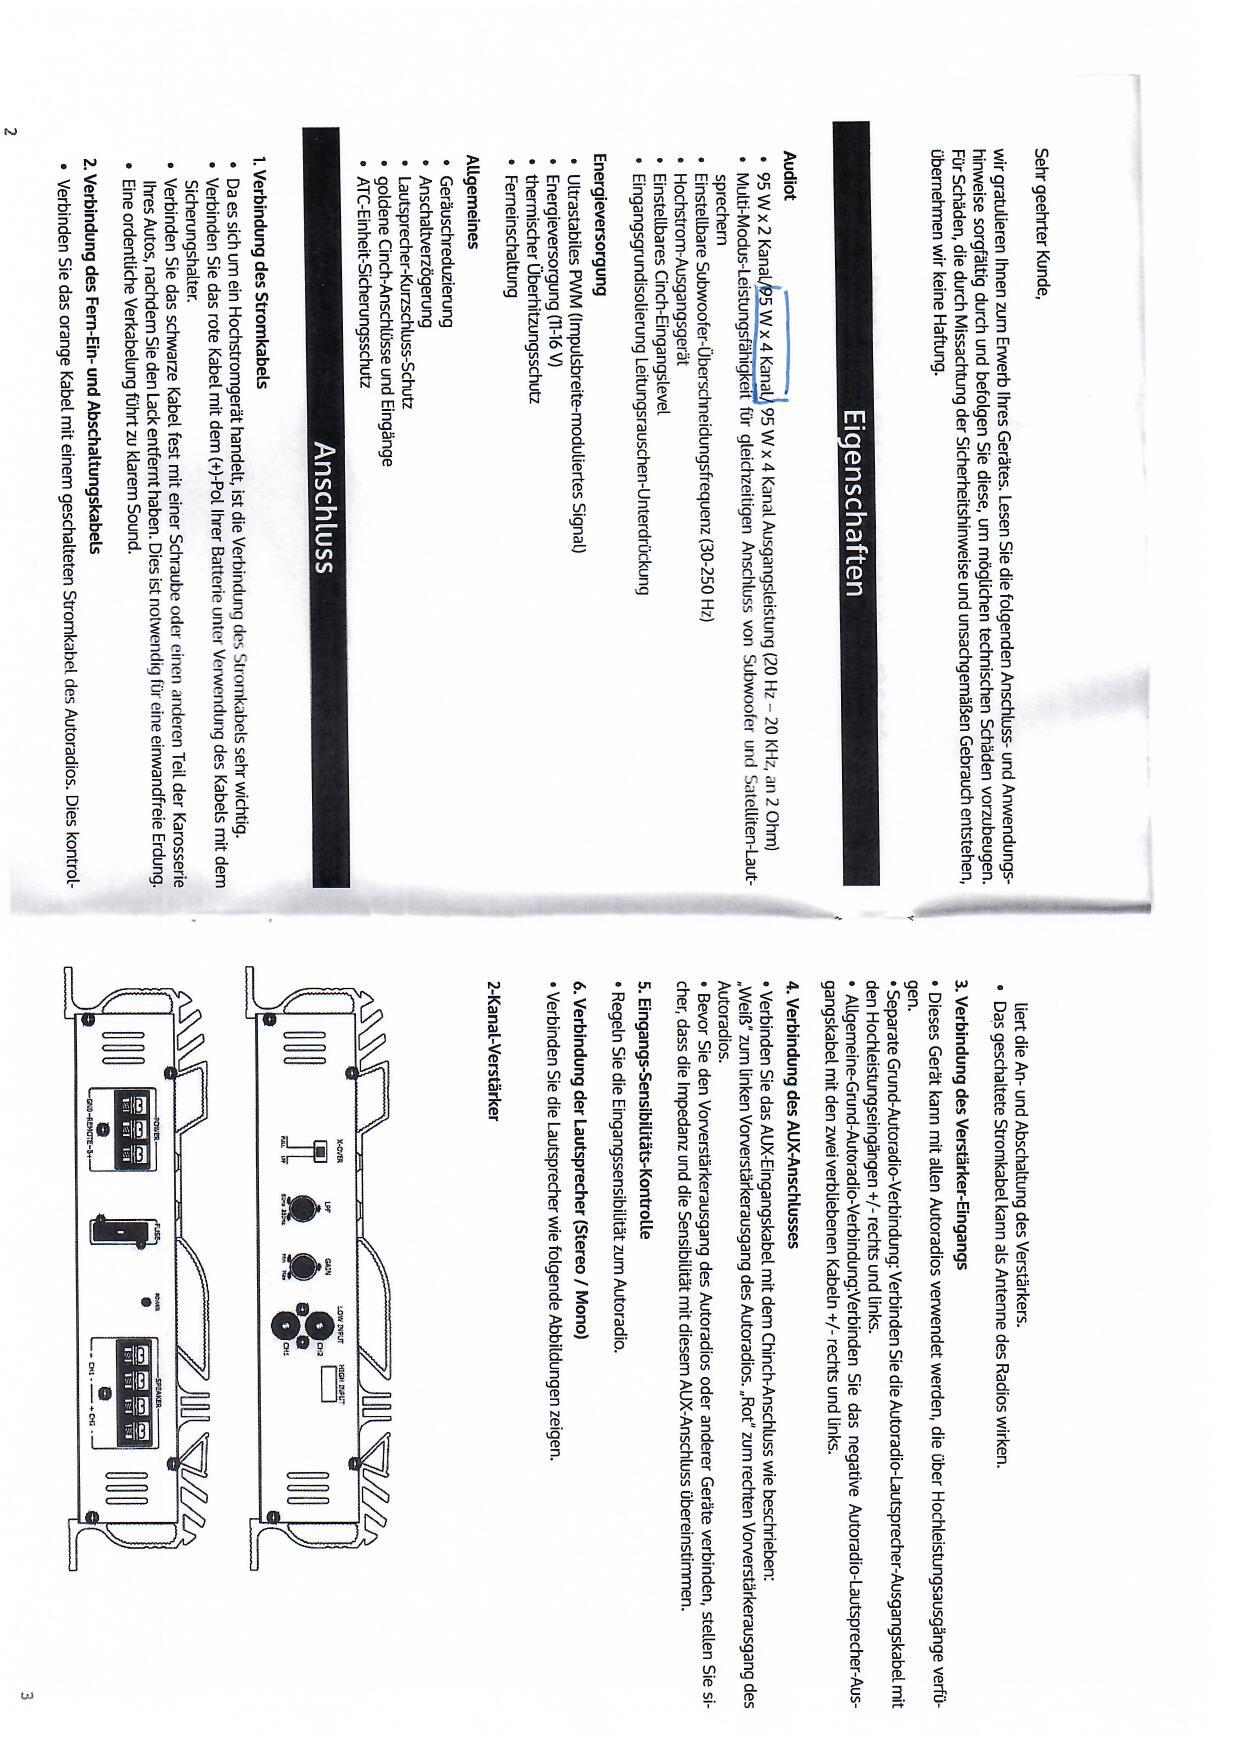 Tolle Autoradio Verbindungen Fotos - Schaltplan Serie Circuit ...